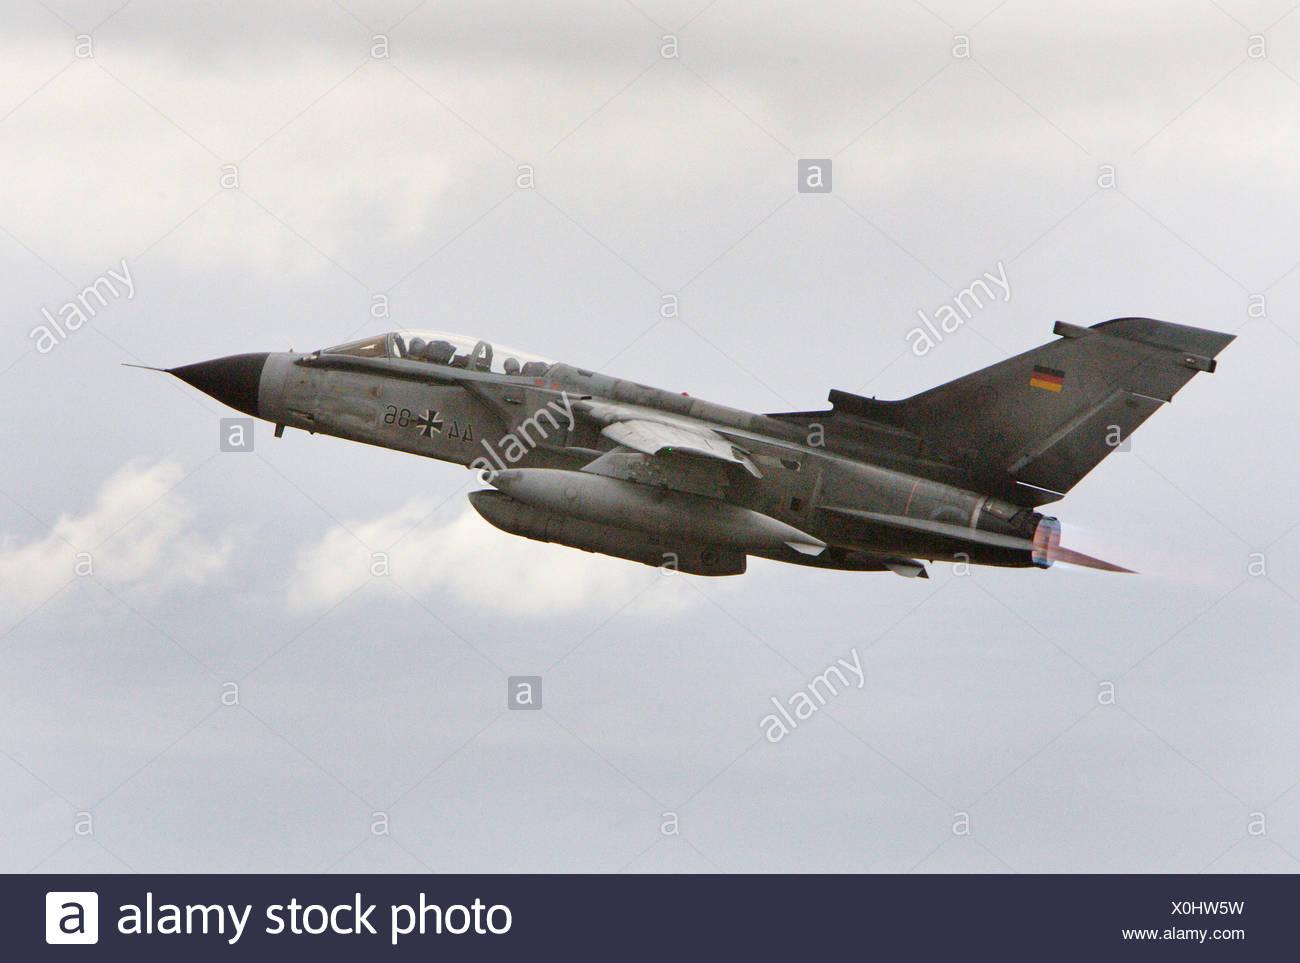 A Panavia Tornado taking off, Jagel, Germany - Stock Image